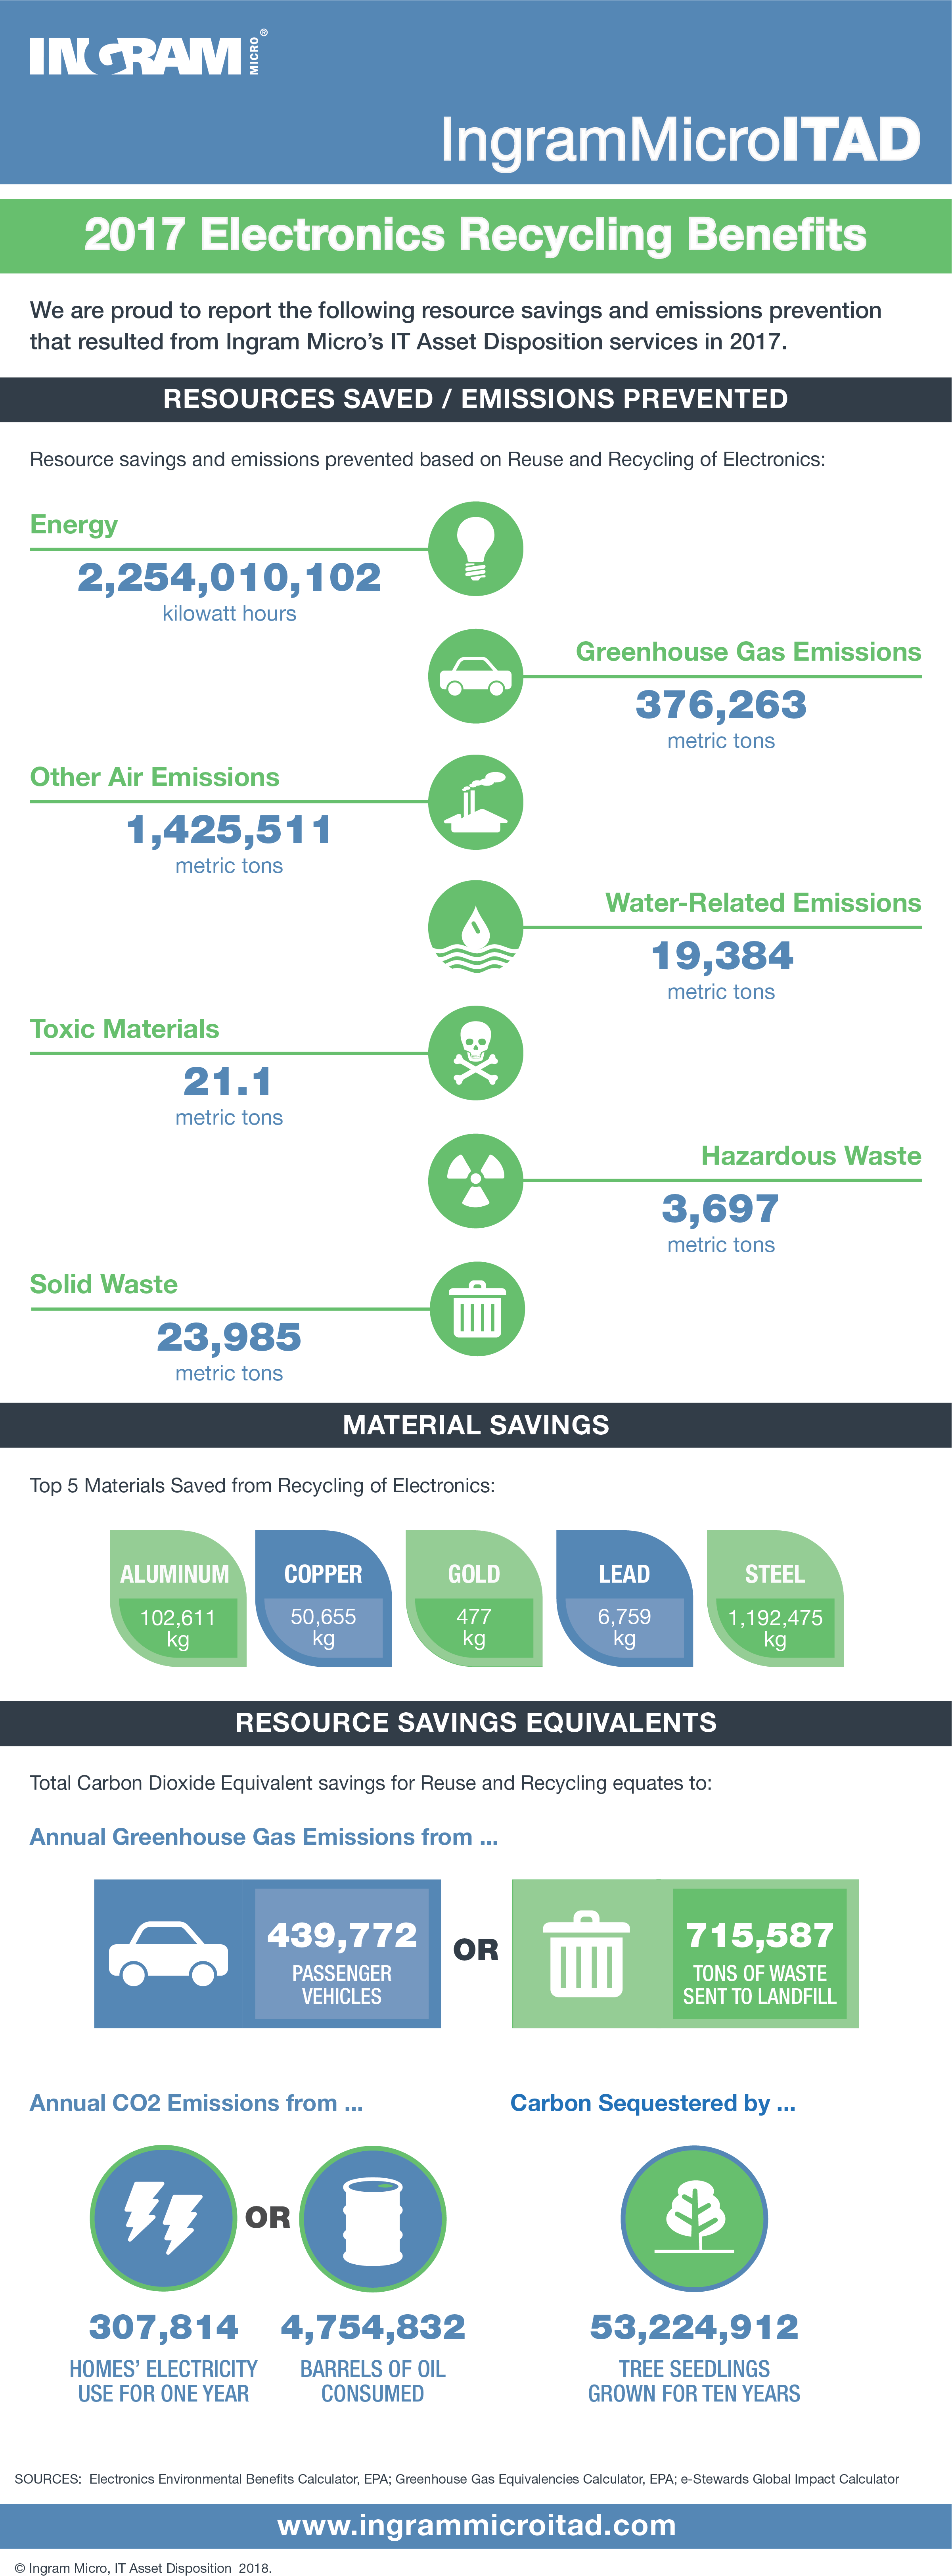 ITAD Earthday infographic